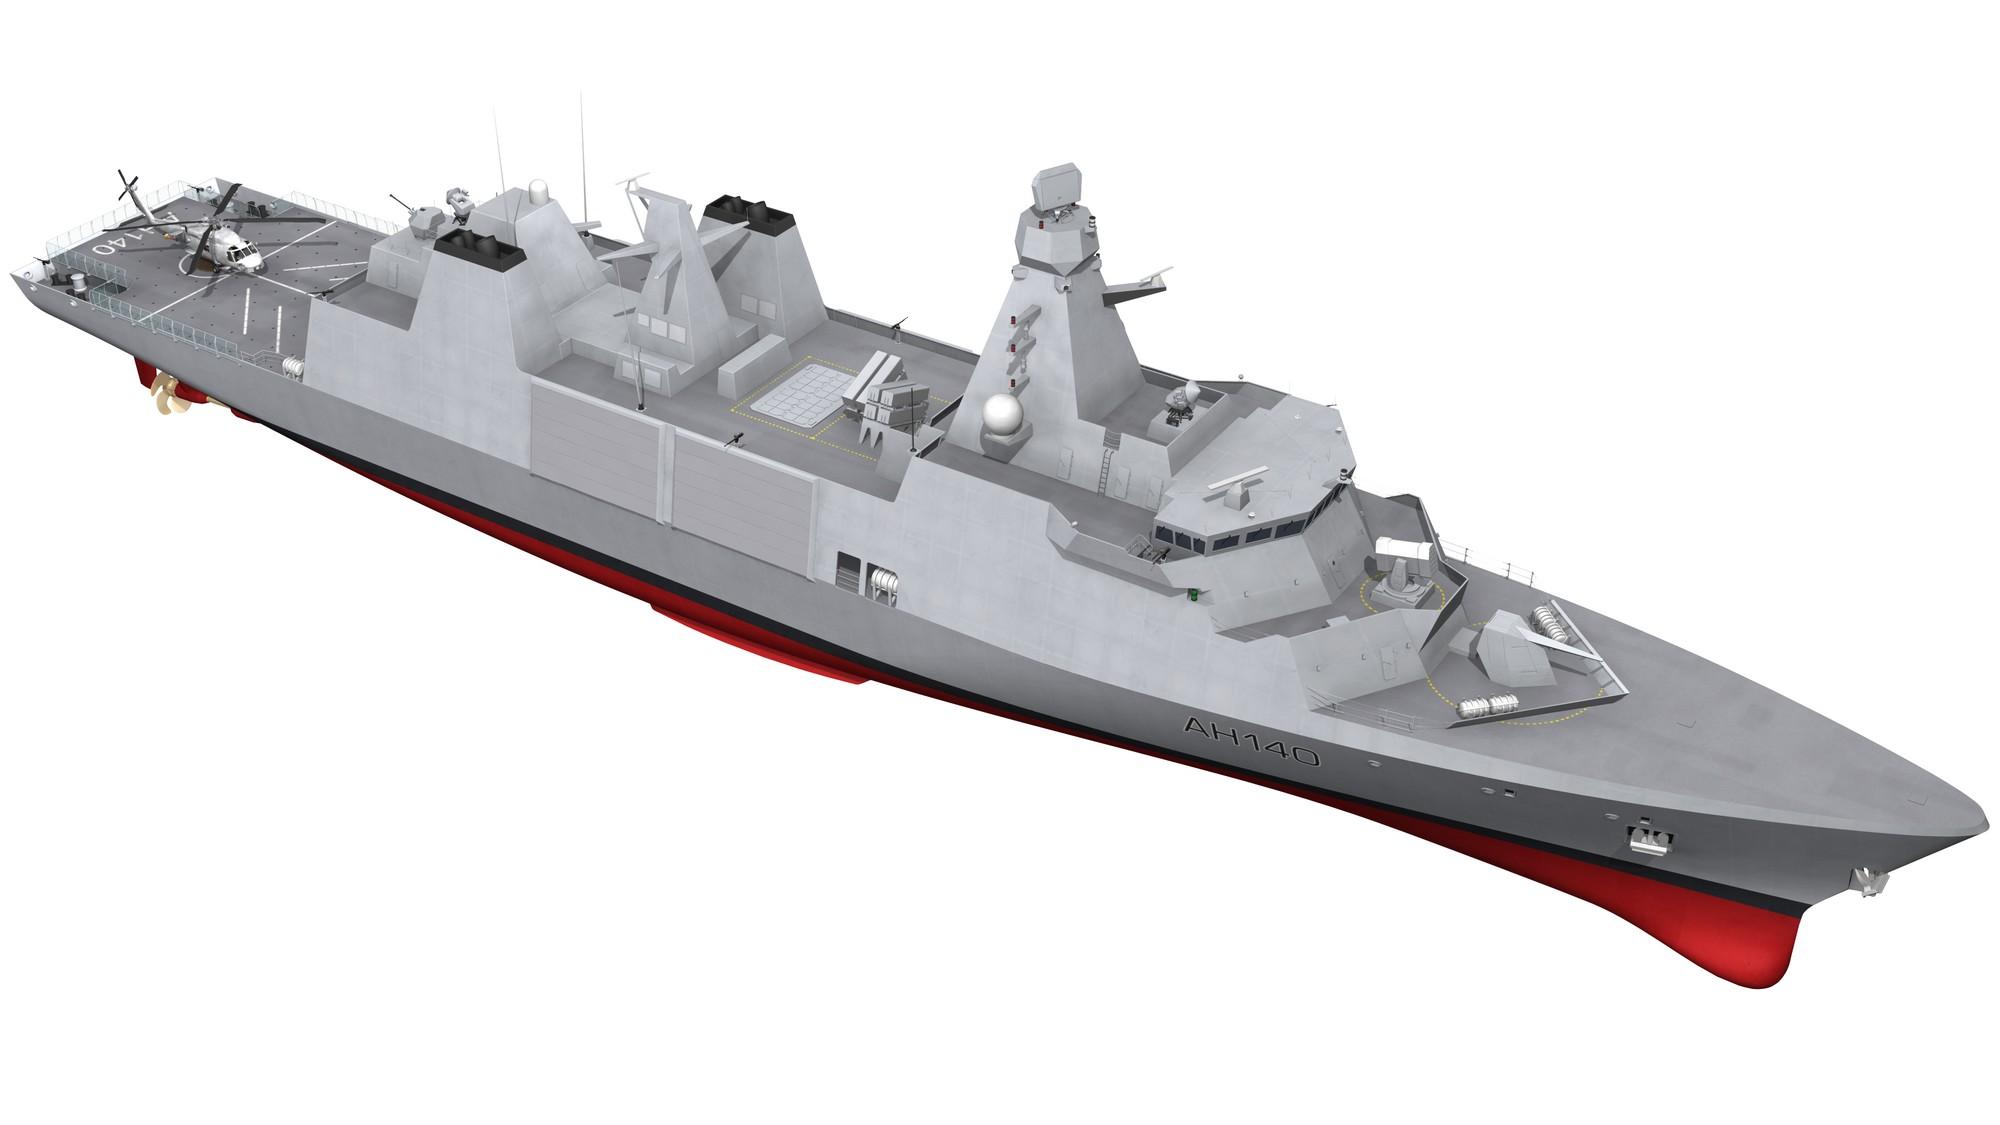 Force 5 Sailboat Boat Hull Cover Gray Top Gun